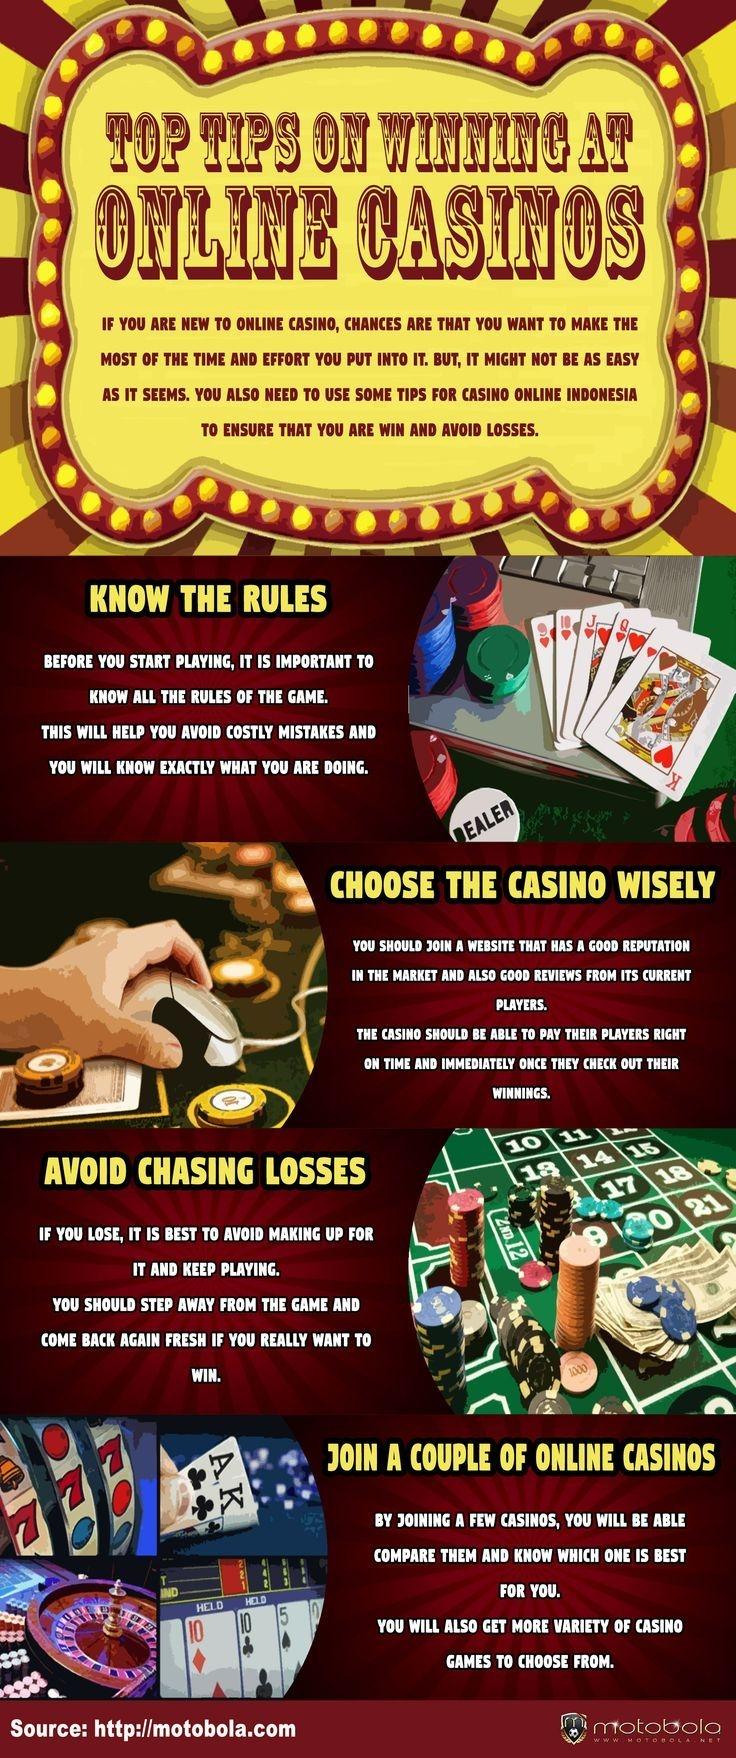 895% Signup casino bonus at Desert Nights